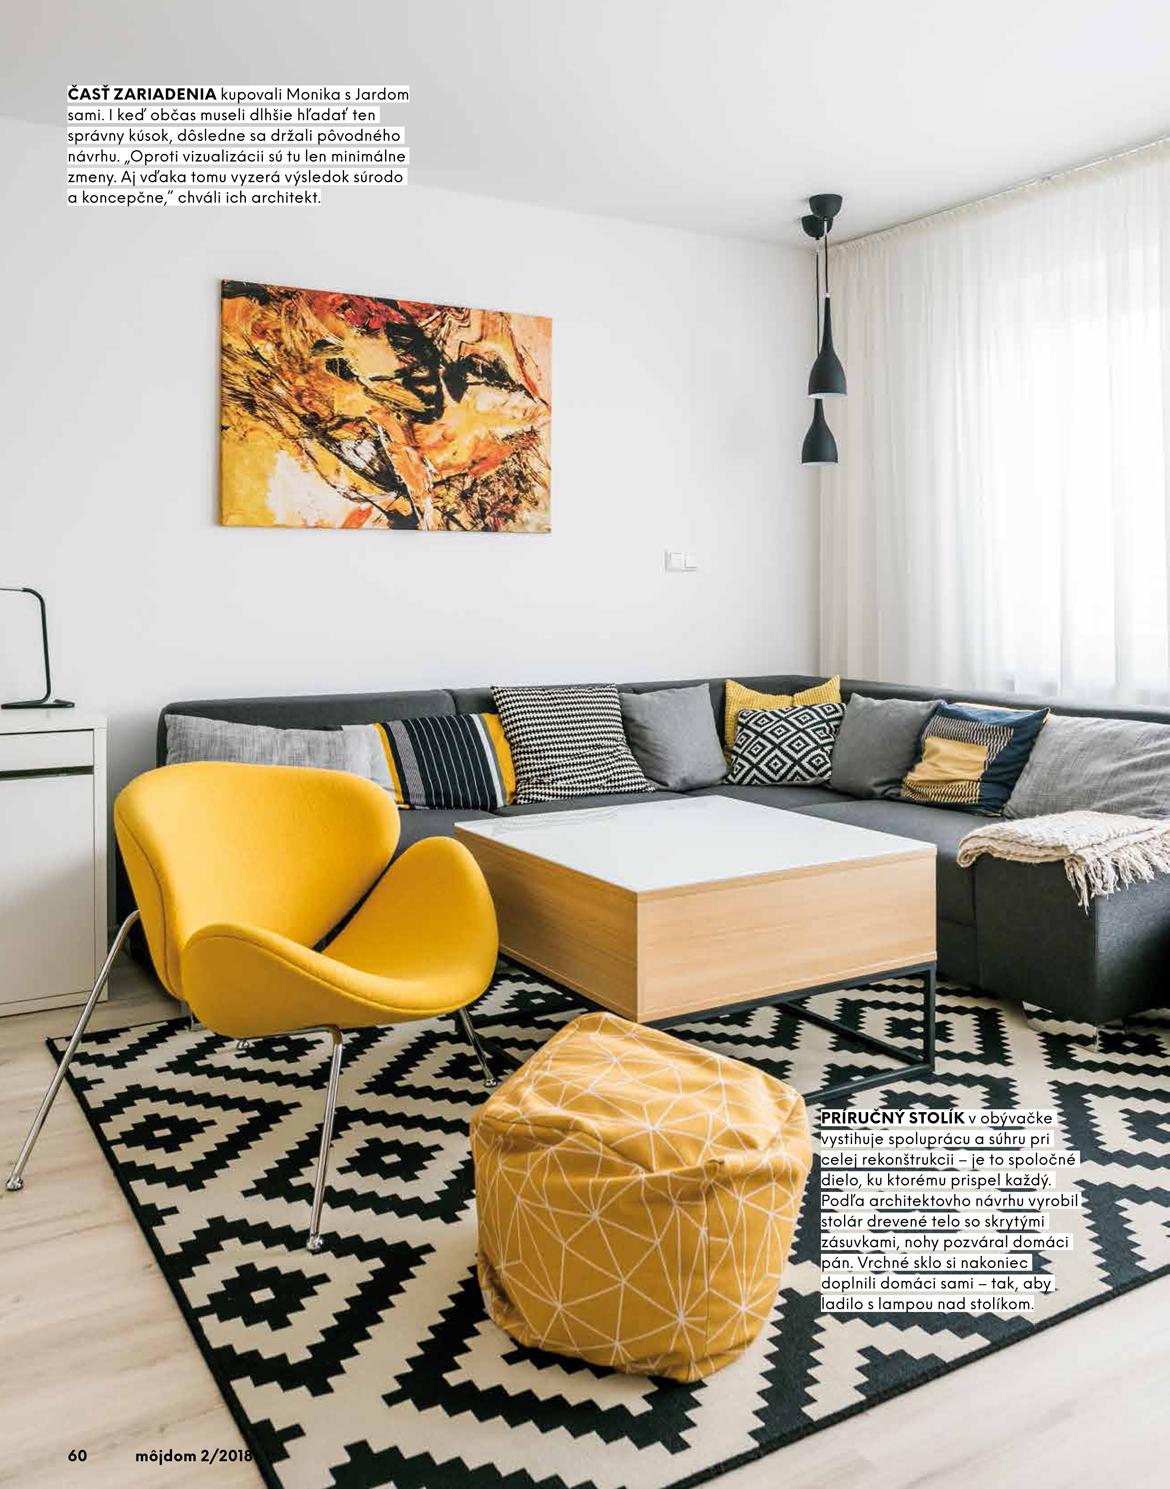 006-byt-cachtice-rekonstrukcia-interier-mojdom-pavlech-architekti